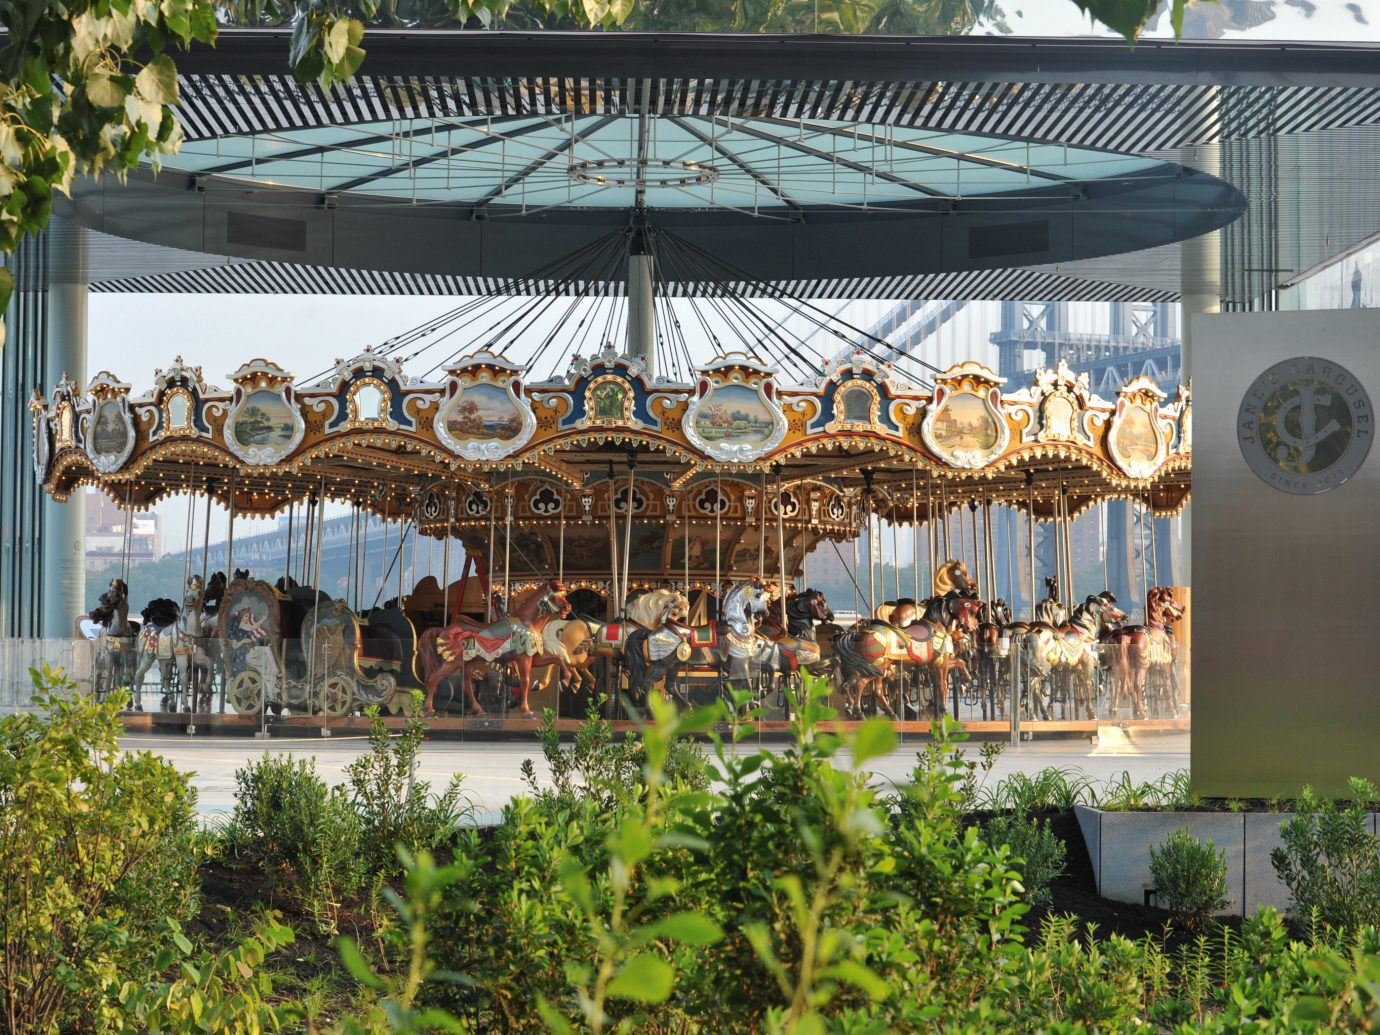 Trip Ideas tree outdoor outdoor structure recreation park amusement park gazebo amusement ride tourist attraction ride